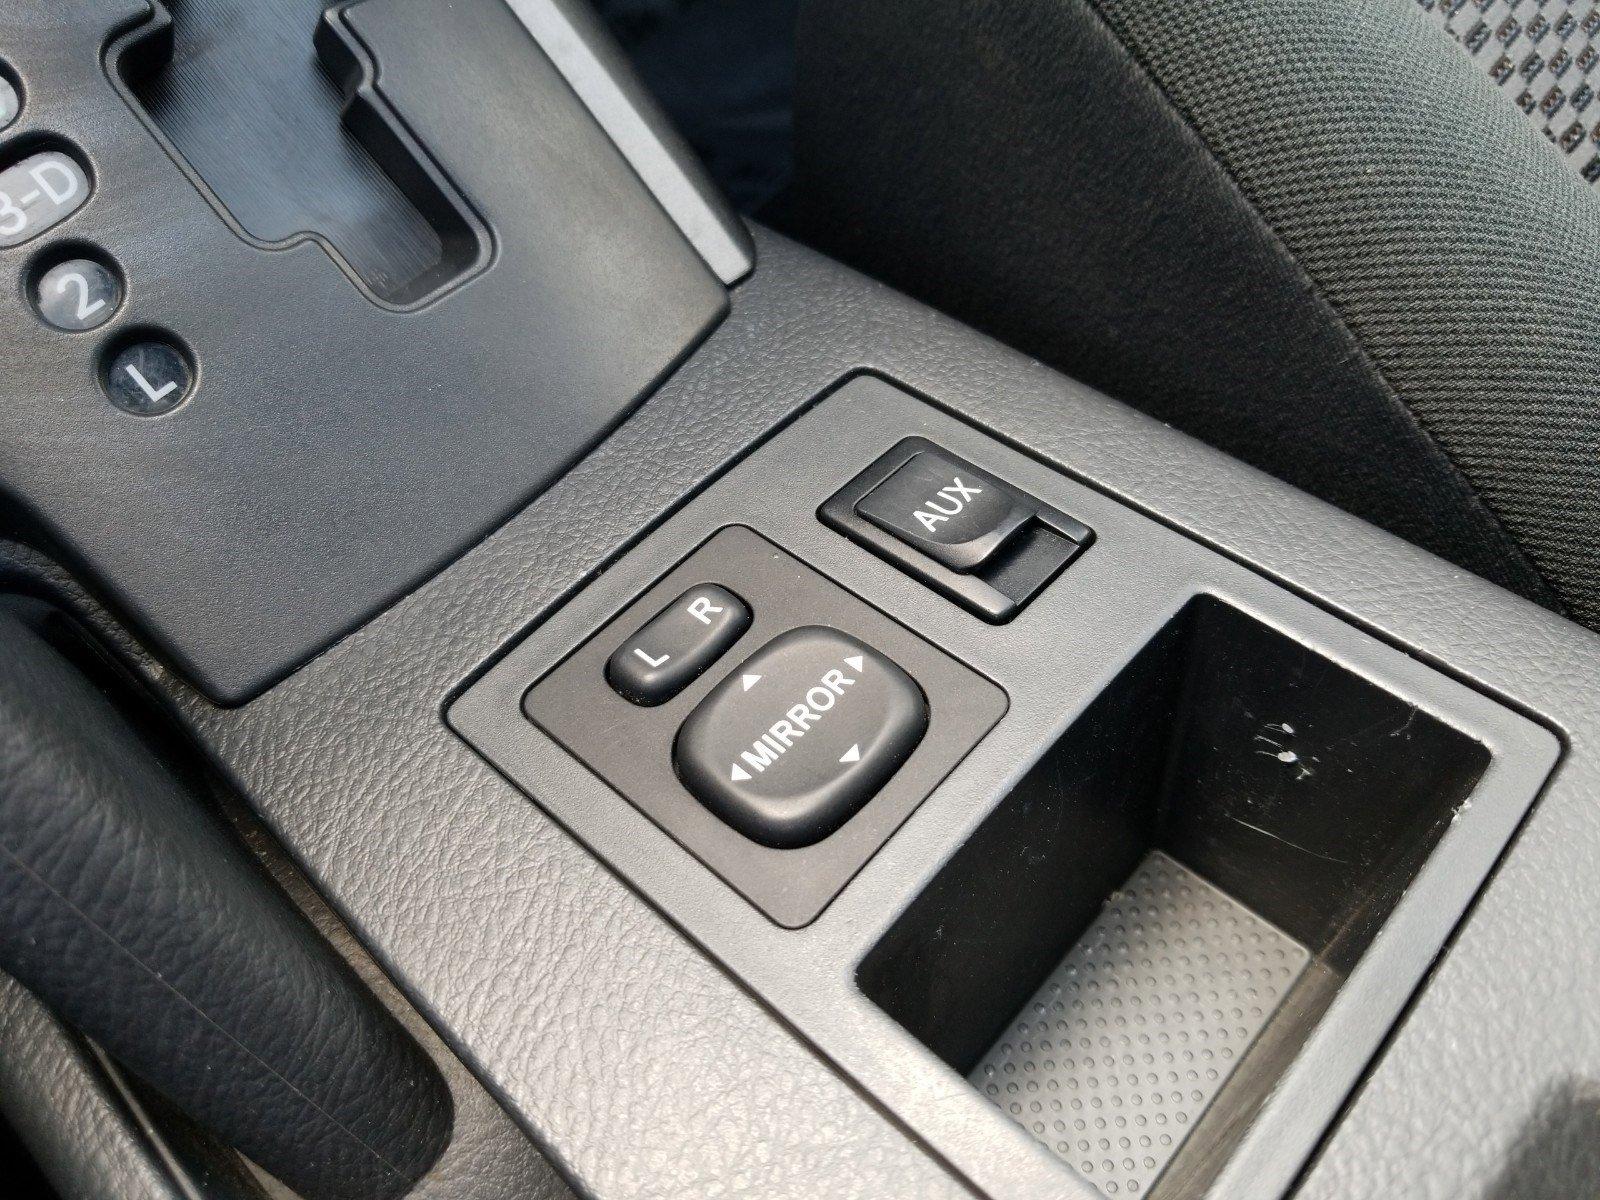 Used 2011 Toyota RAV4 Sport Sport Utility for sale in Lincoln NE